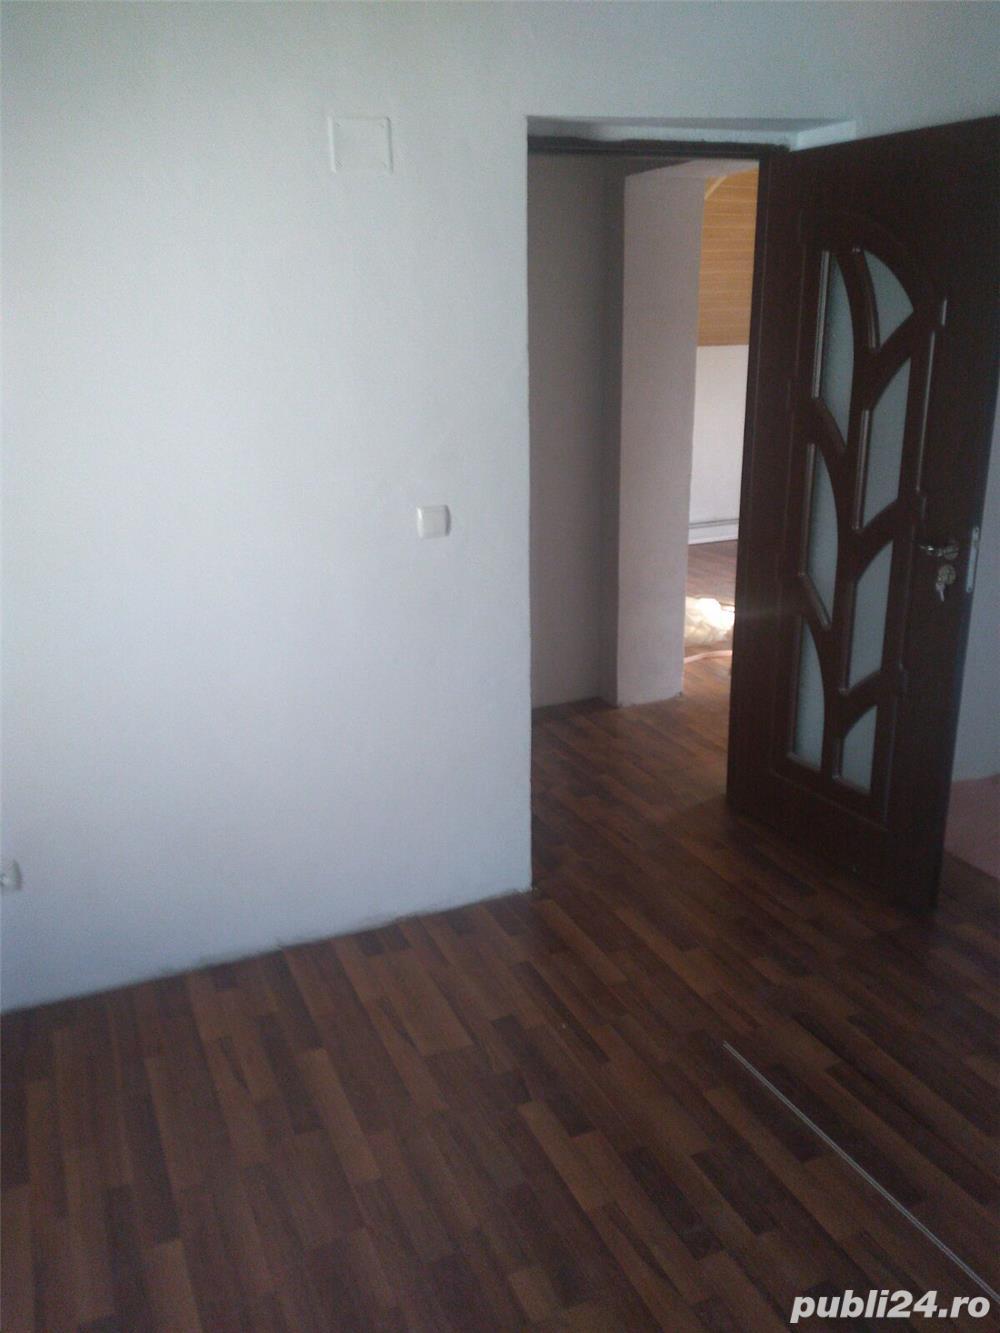 Inchiriere  casa  3 camere Valcea, Cazanesti (Ramnicu Valcea)  - 180 EURO lunar